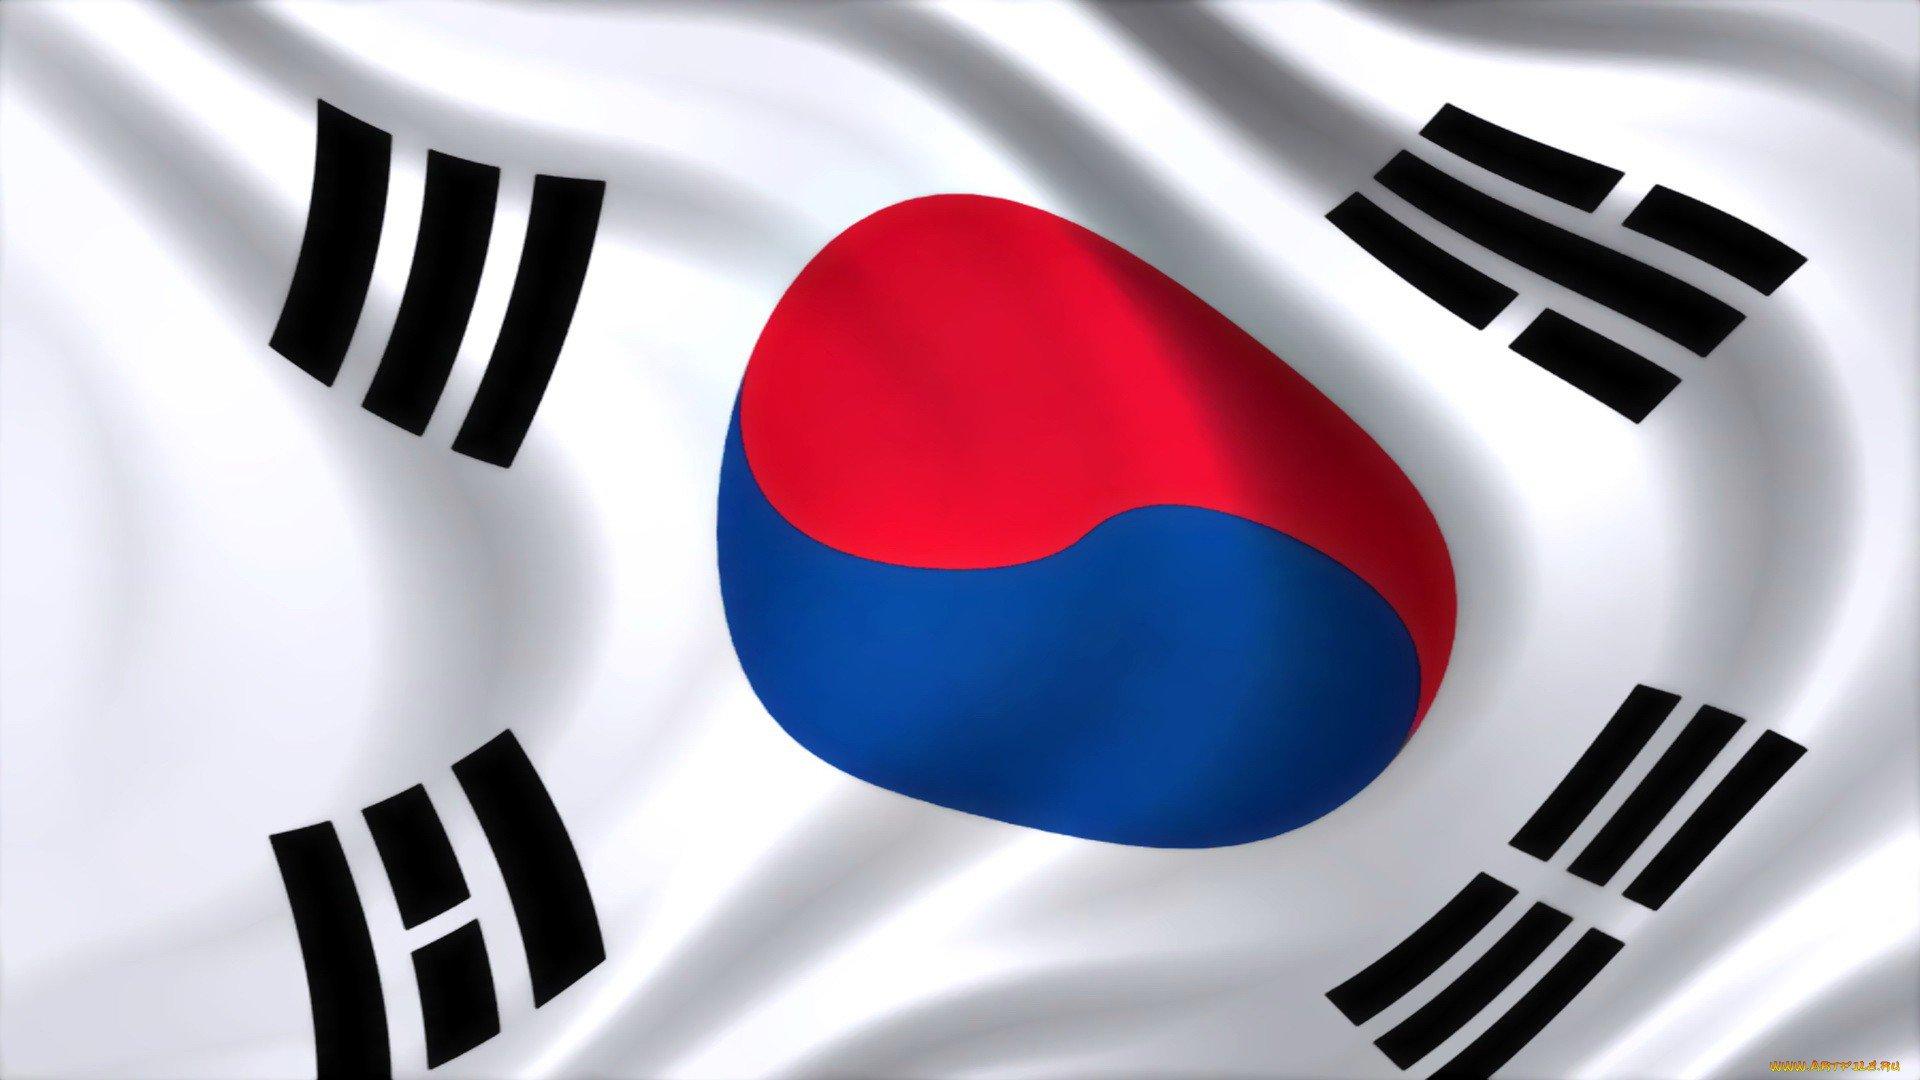 это корея флаг фото база